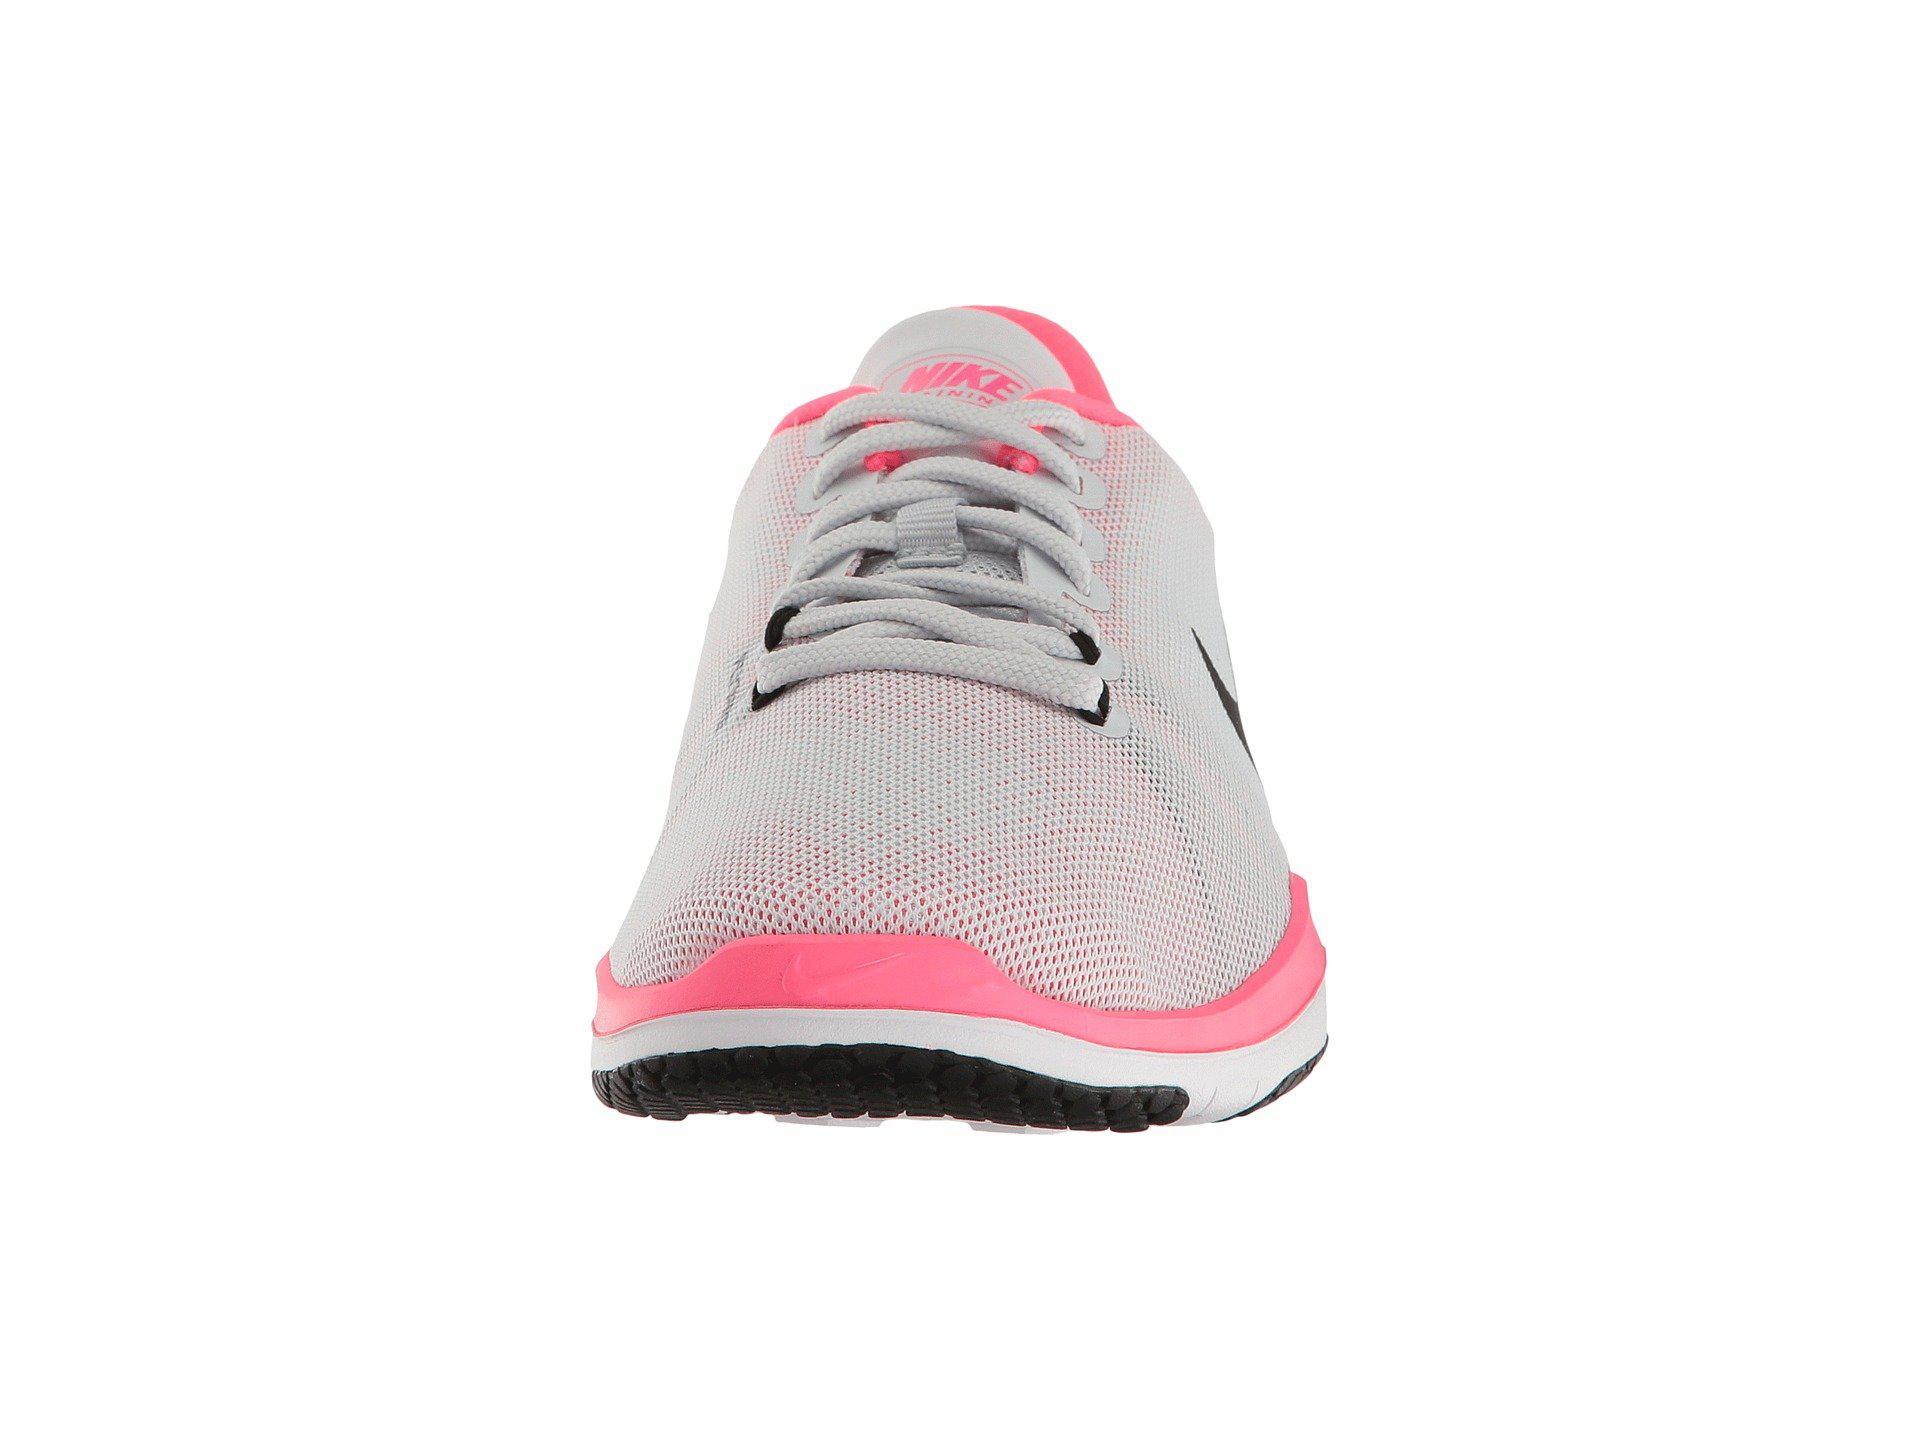 8a35596ecf4f5 Lyst - Nike Flex Supreme Tr 5 in Pink